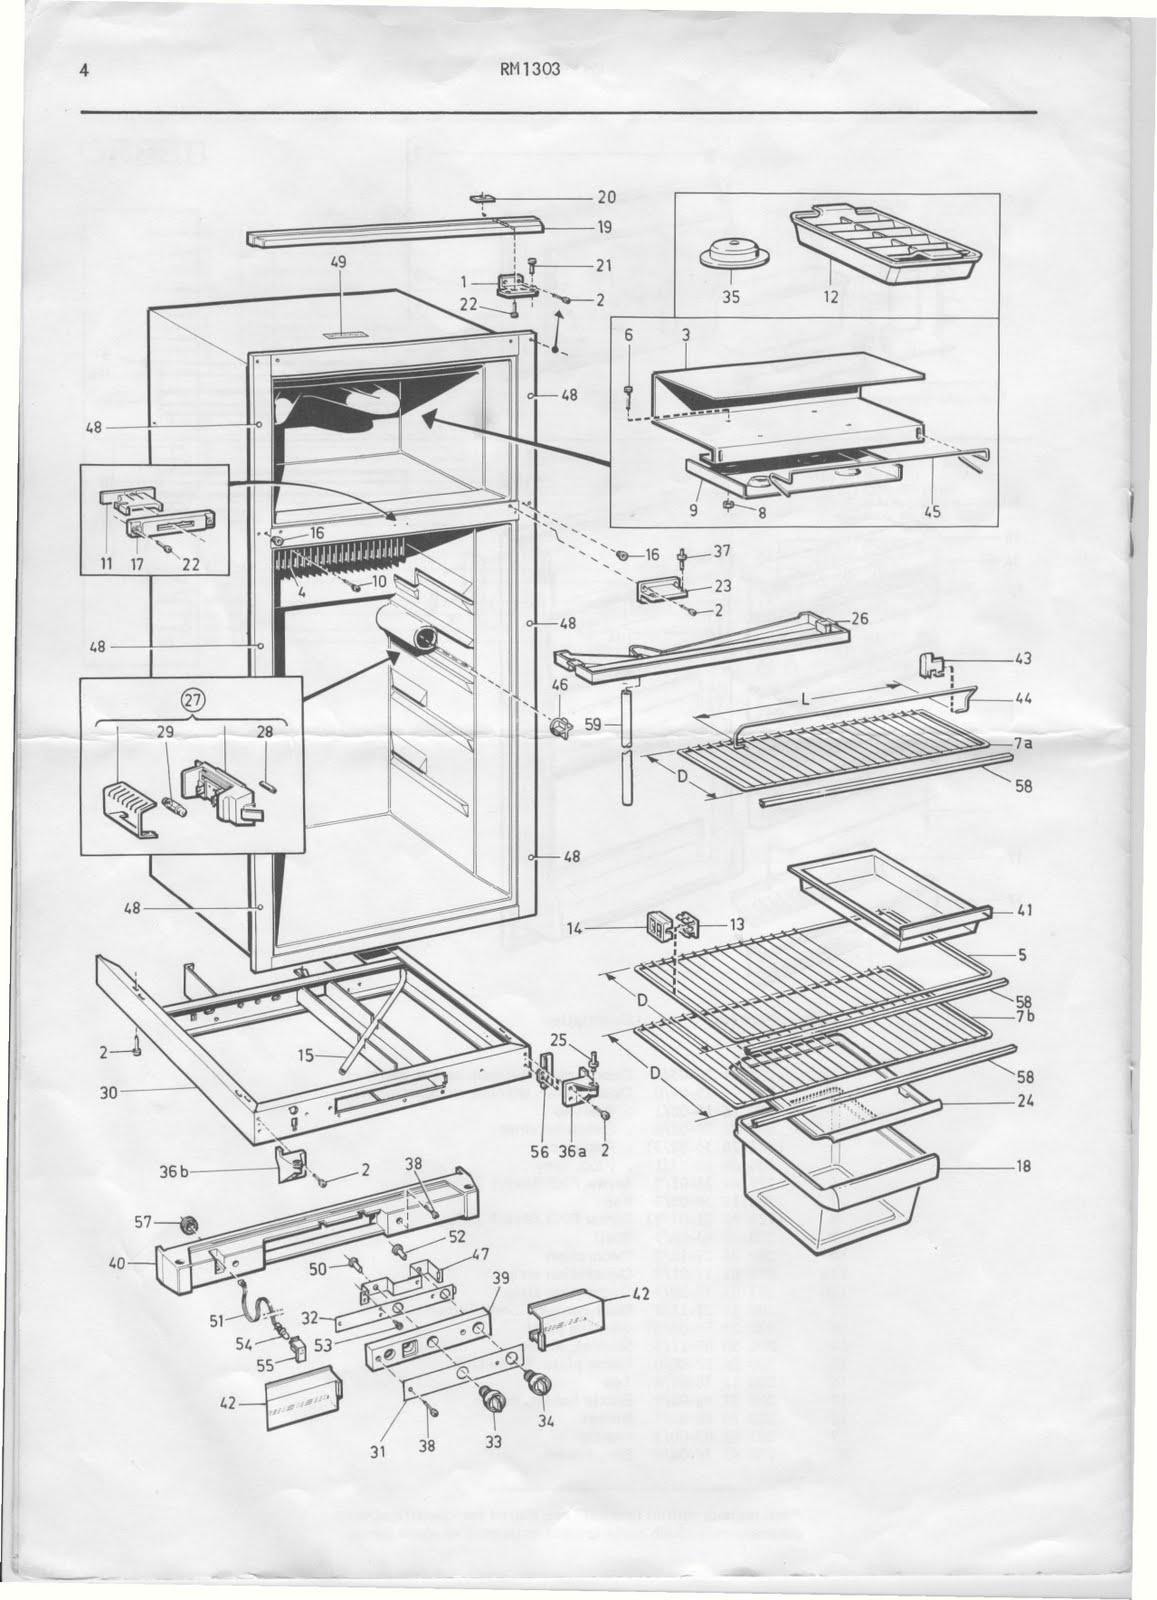 dometic awning parts diagram jeep alternator wiring faulkner coleman 12 39 rv